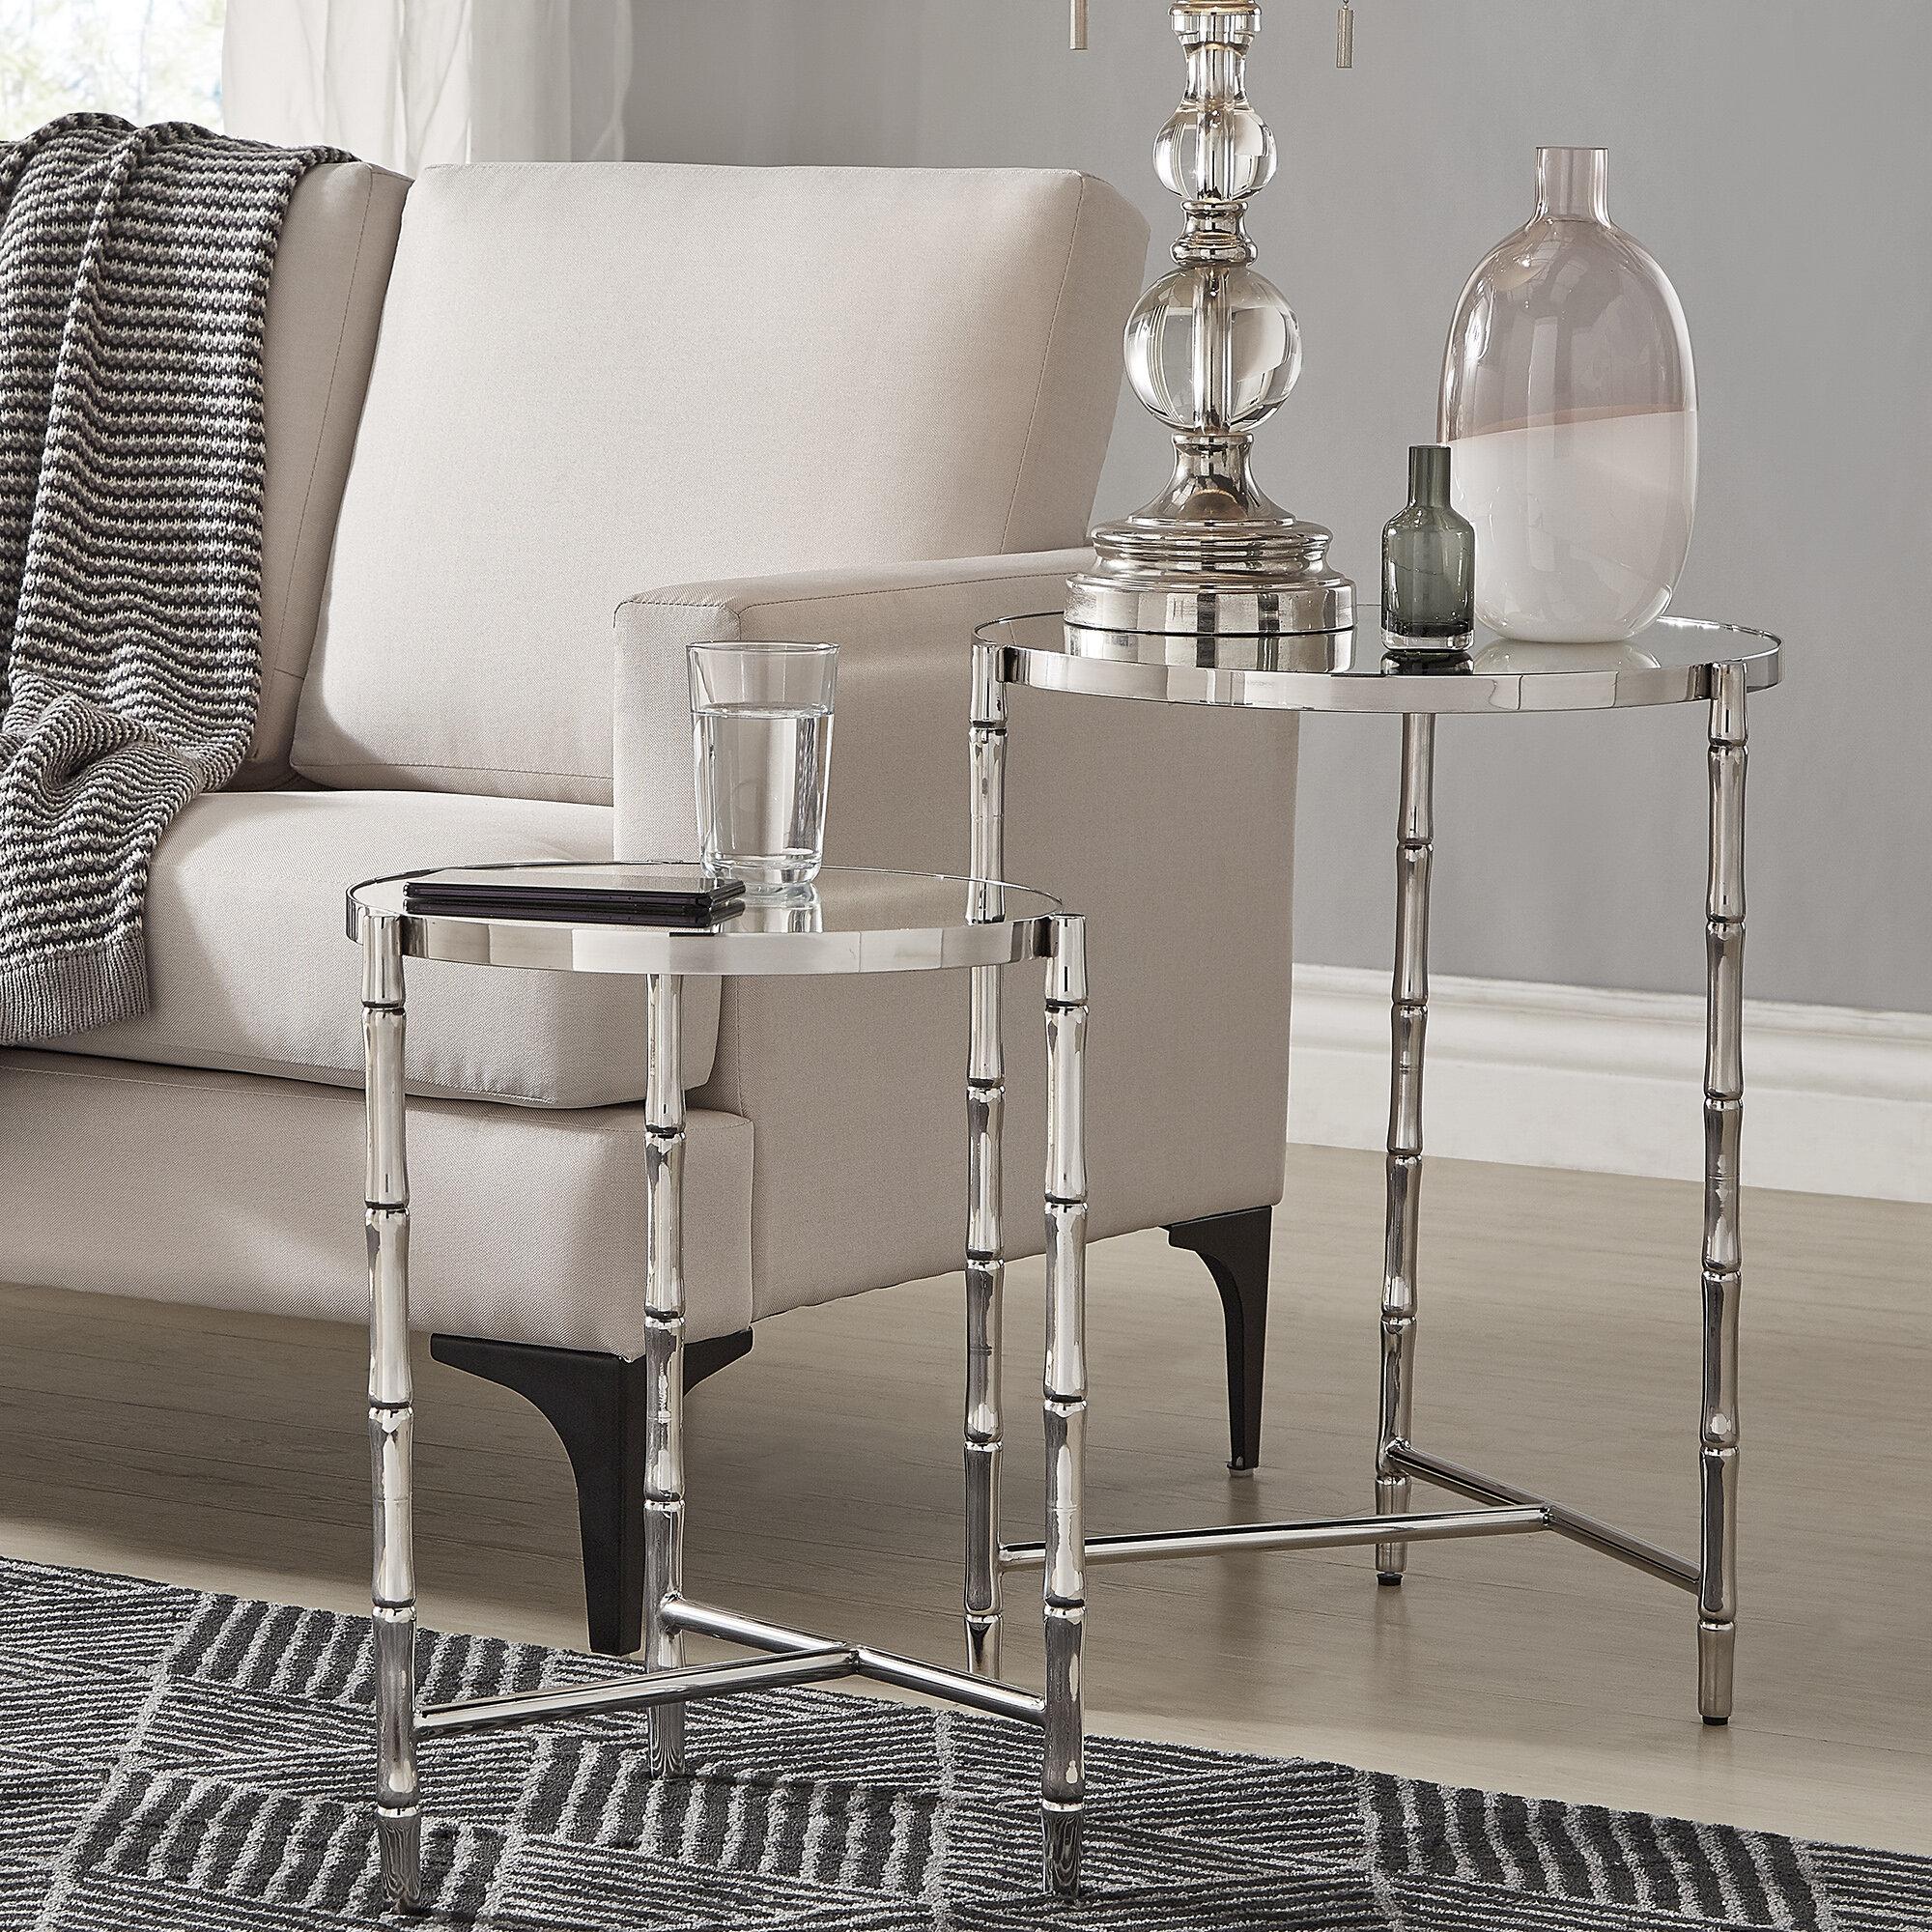 Deco Separation De Piece conlon bamboo-look stainless steel 2 piece nesting tables